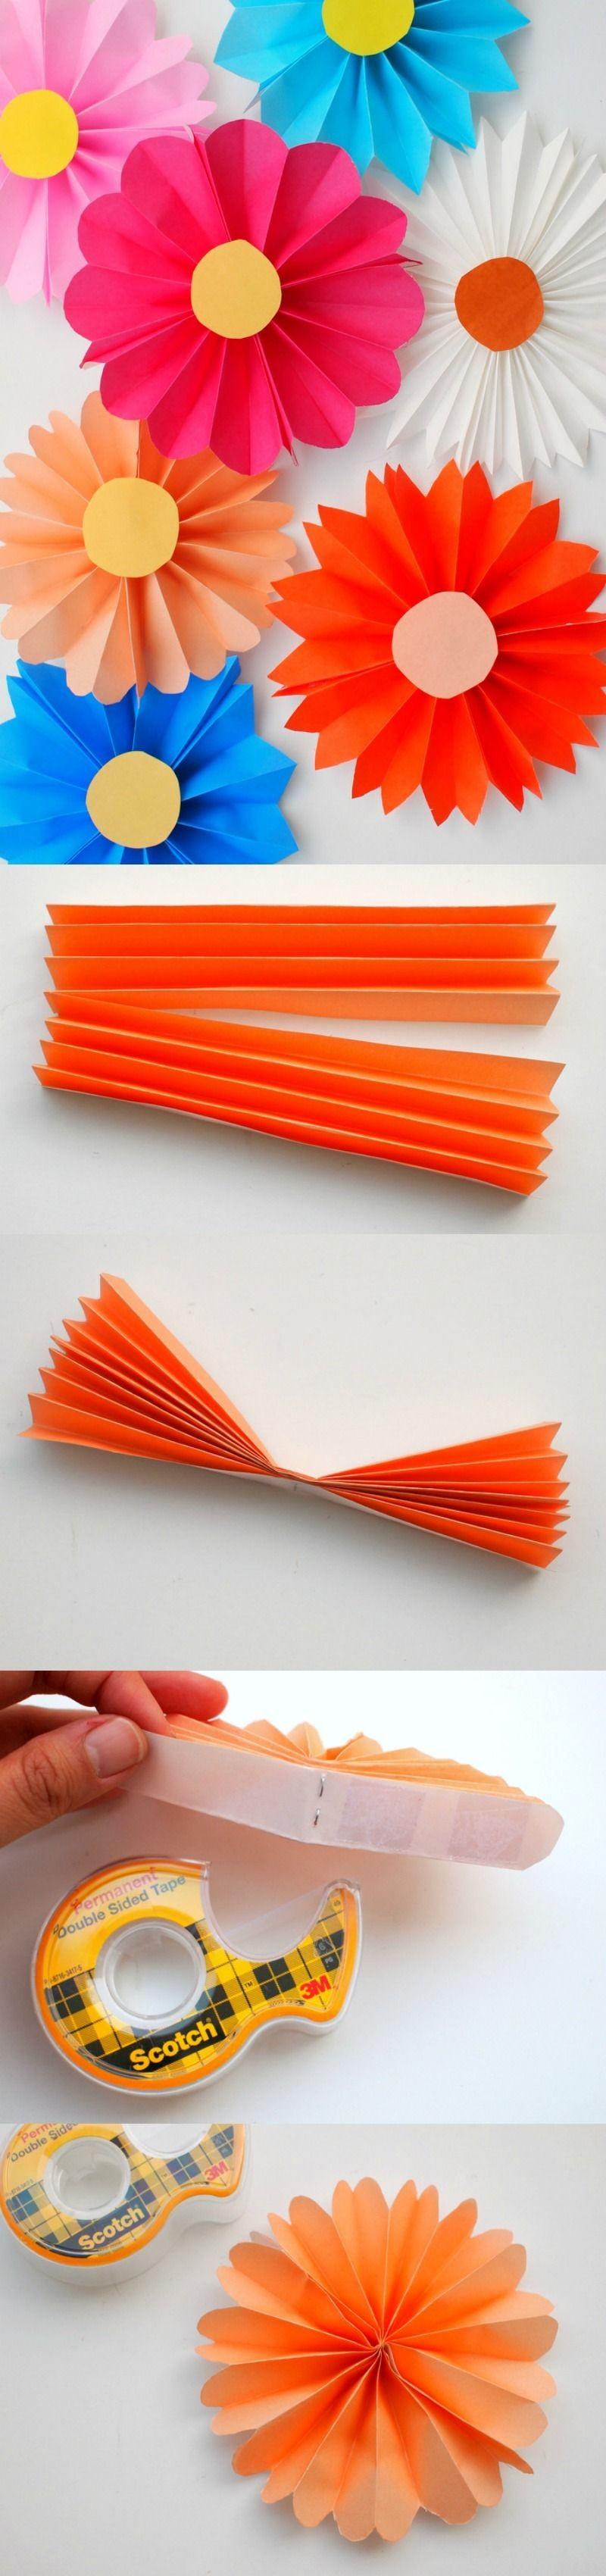 Simple Papercraft Accordion Paper Flowers Craft Diy Pinterest